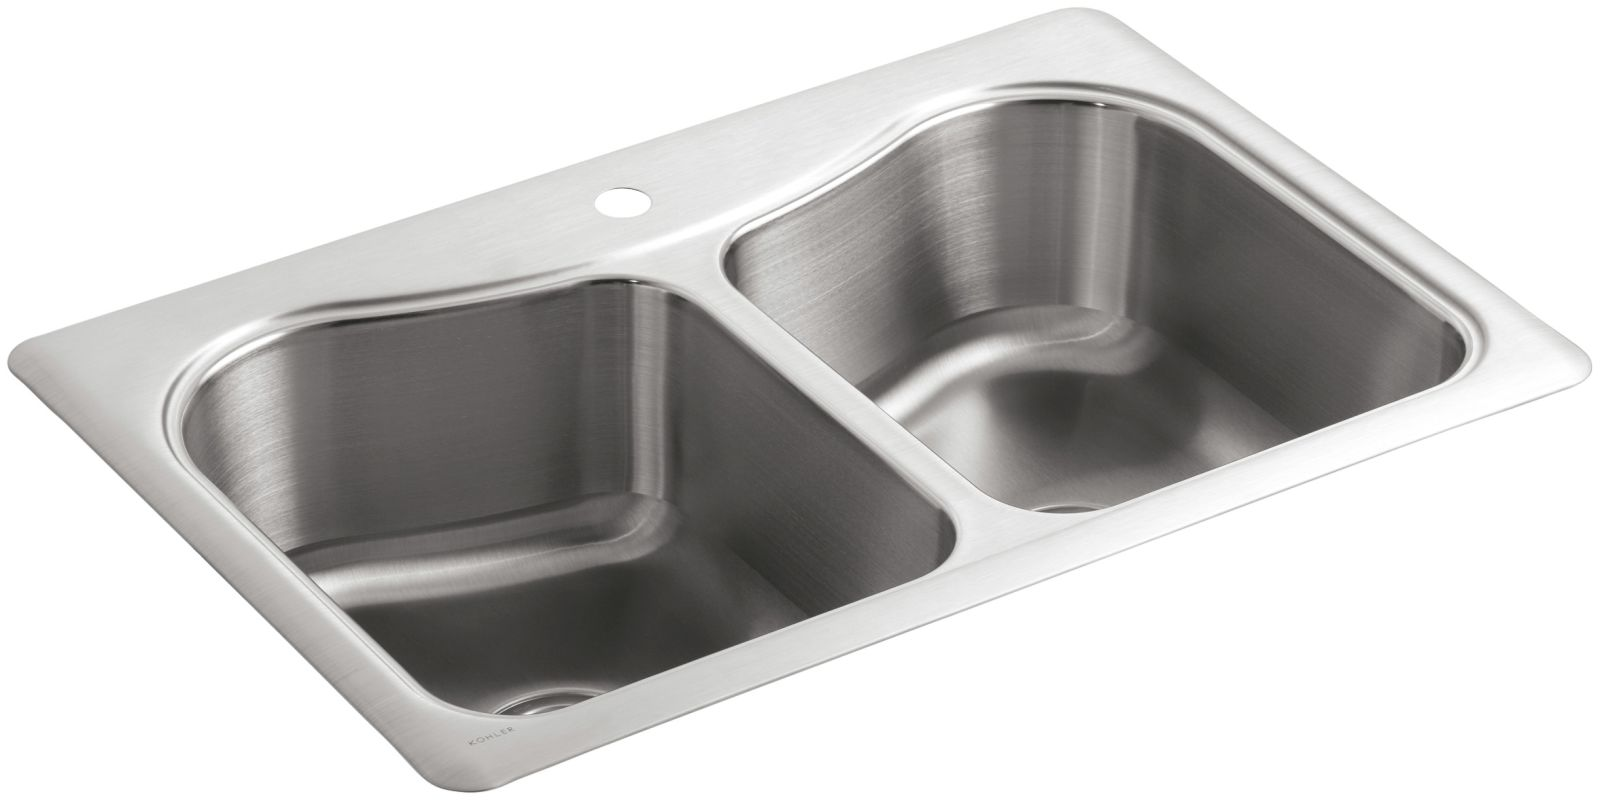 Kohler Staccato Kitchen Sink